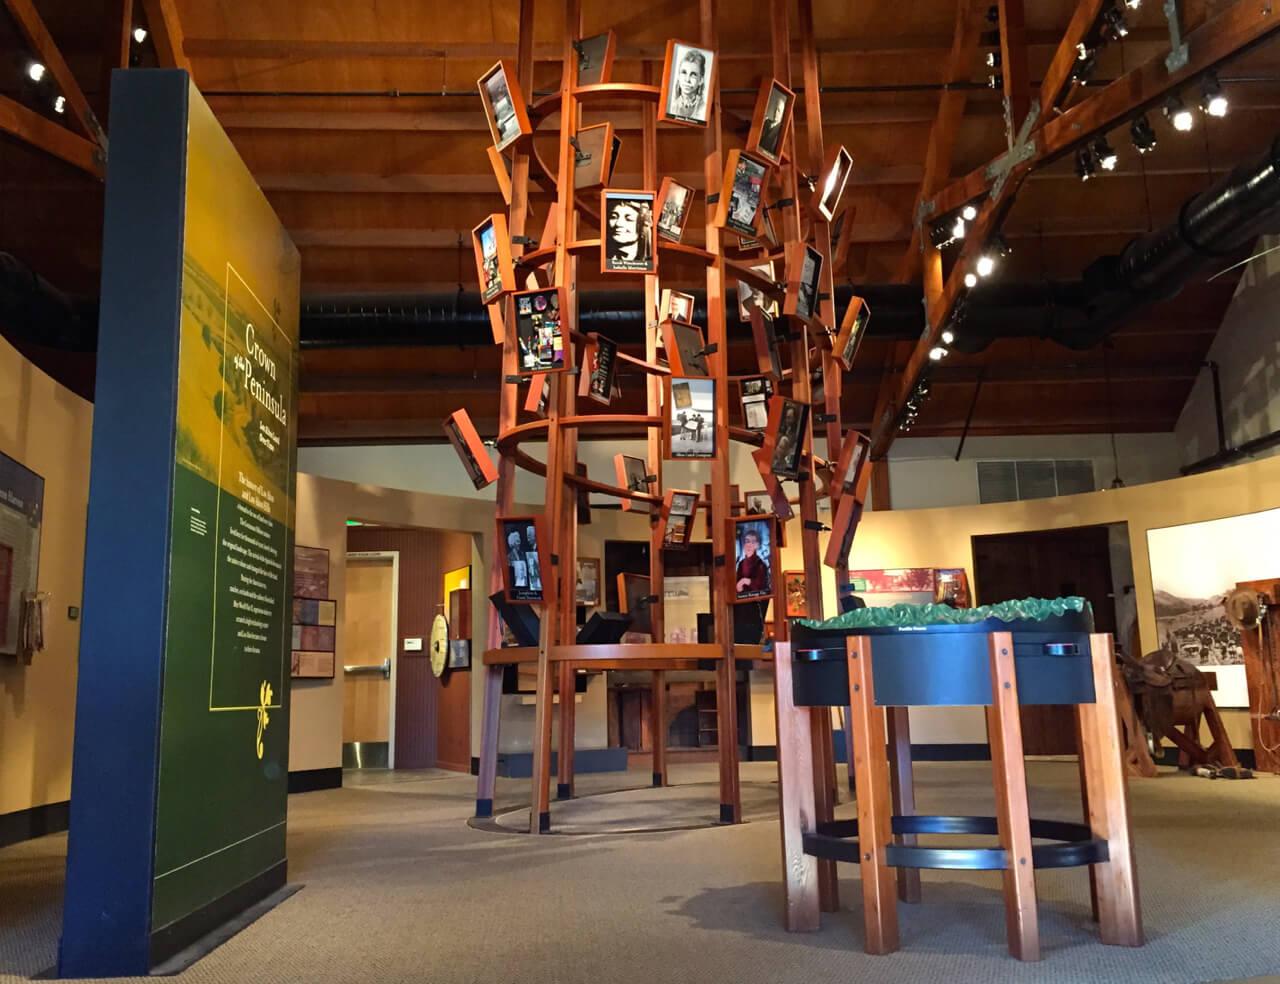 1-Los-Altos-History-Museum-The Sibbett Group-Tower.jpg